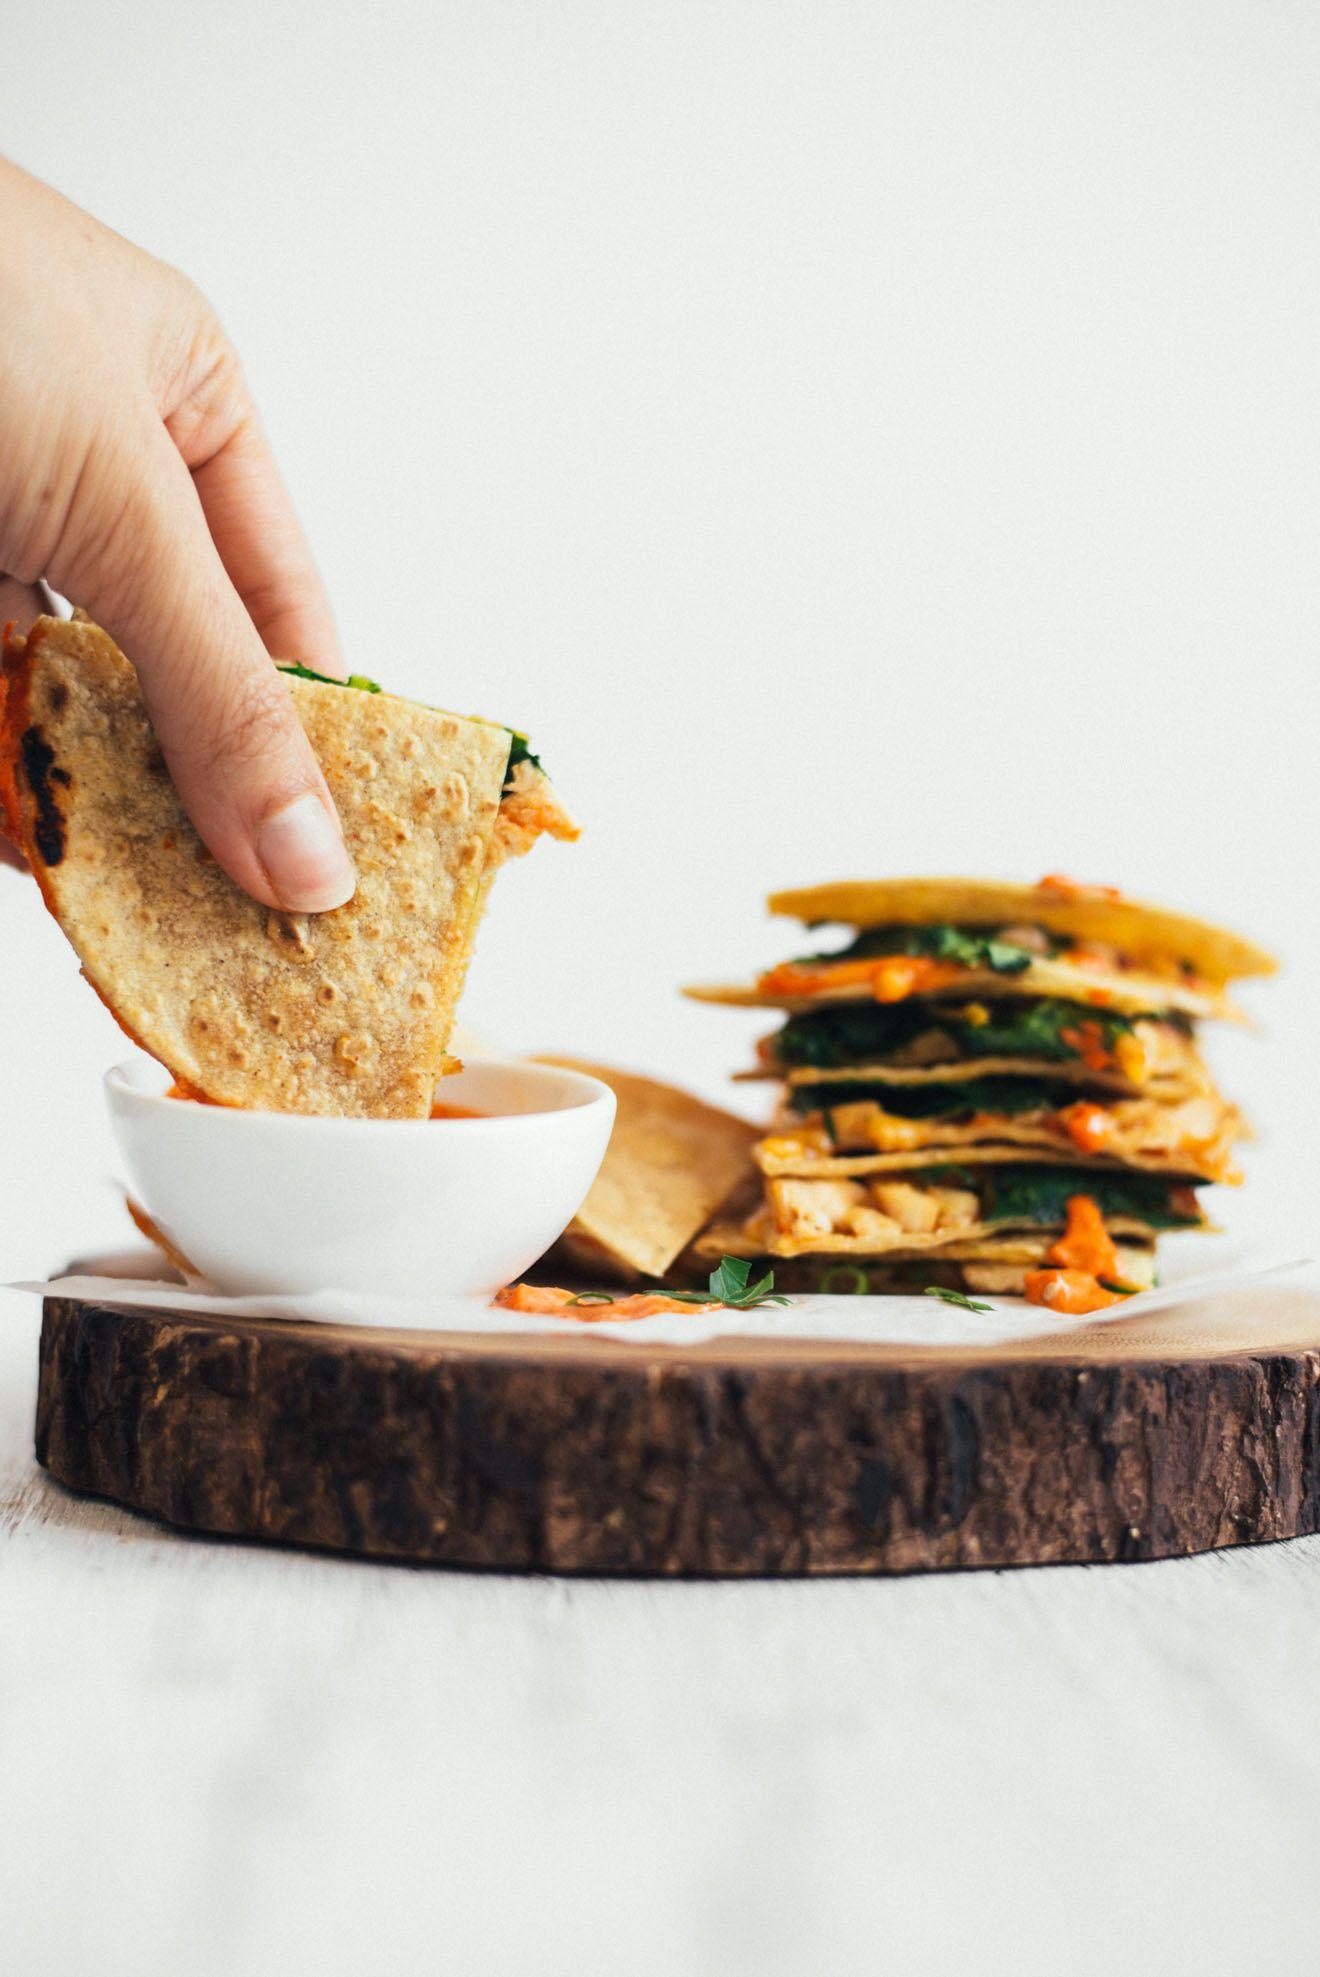 Chicken Quesadillas with Gochujang Sauce Recipe